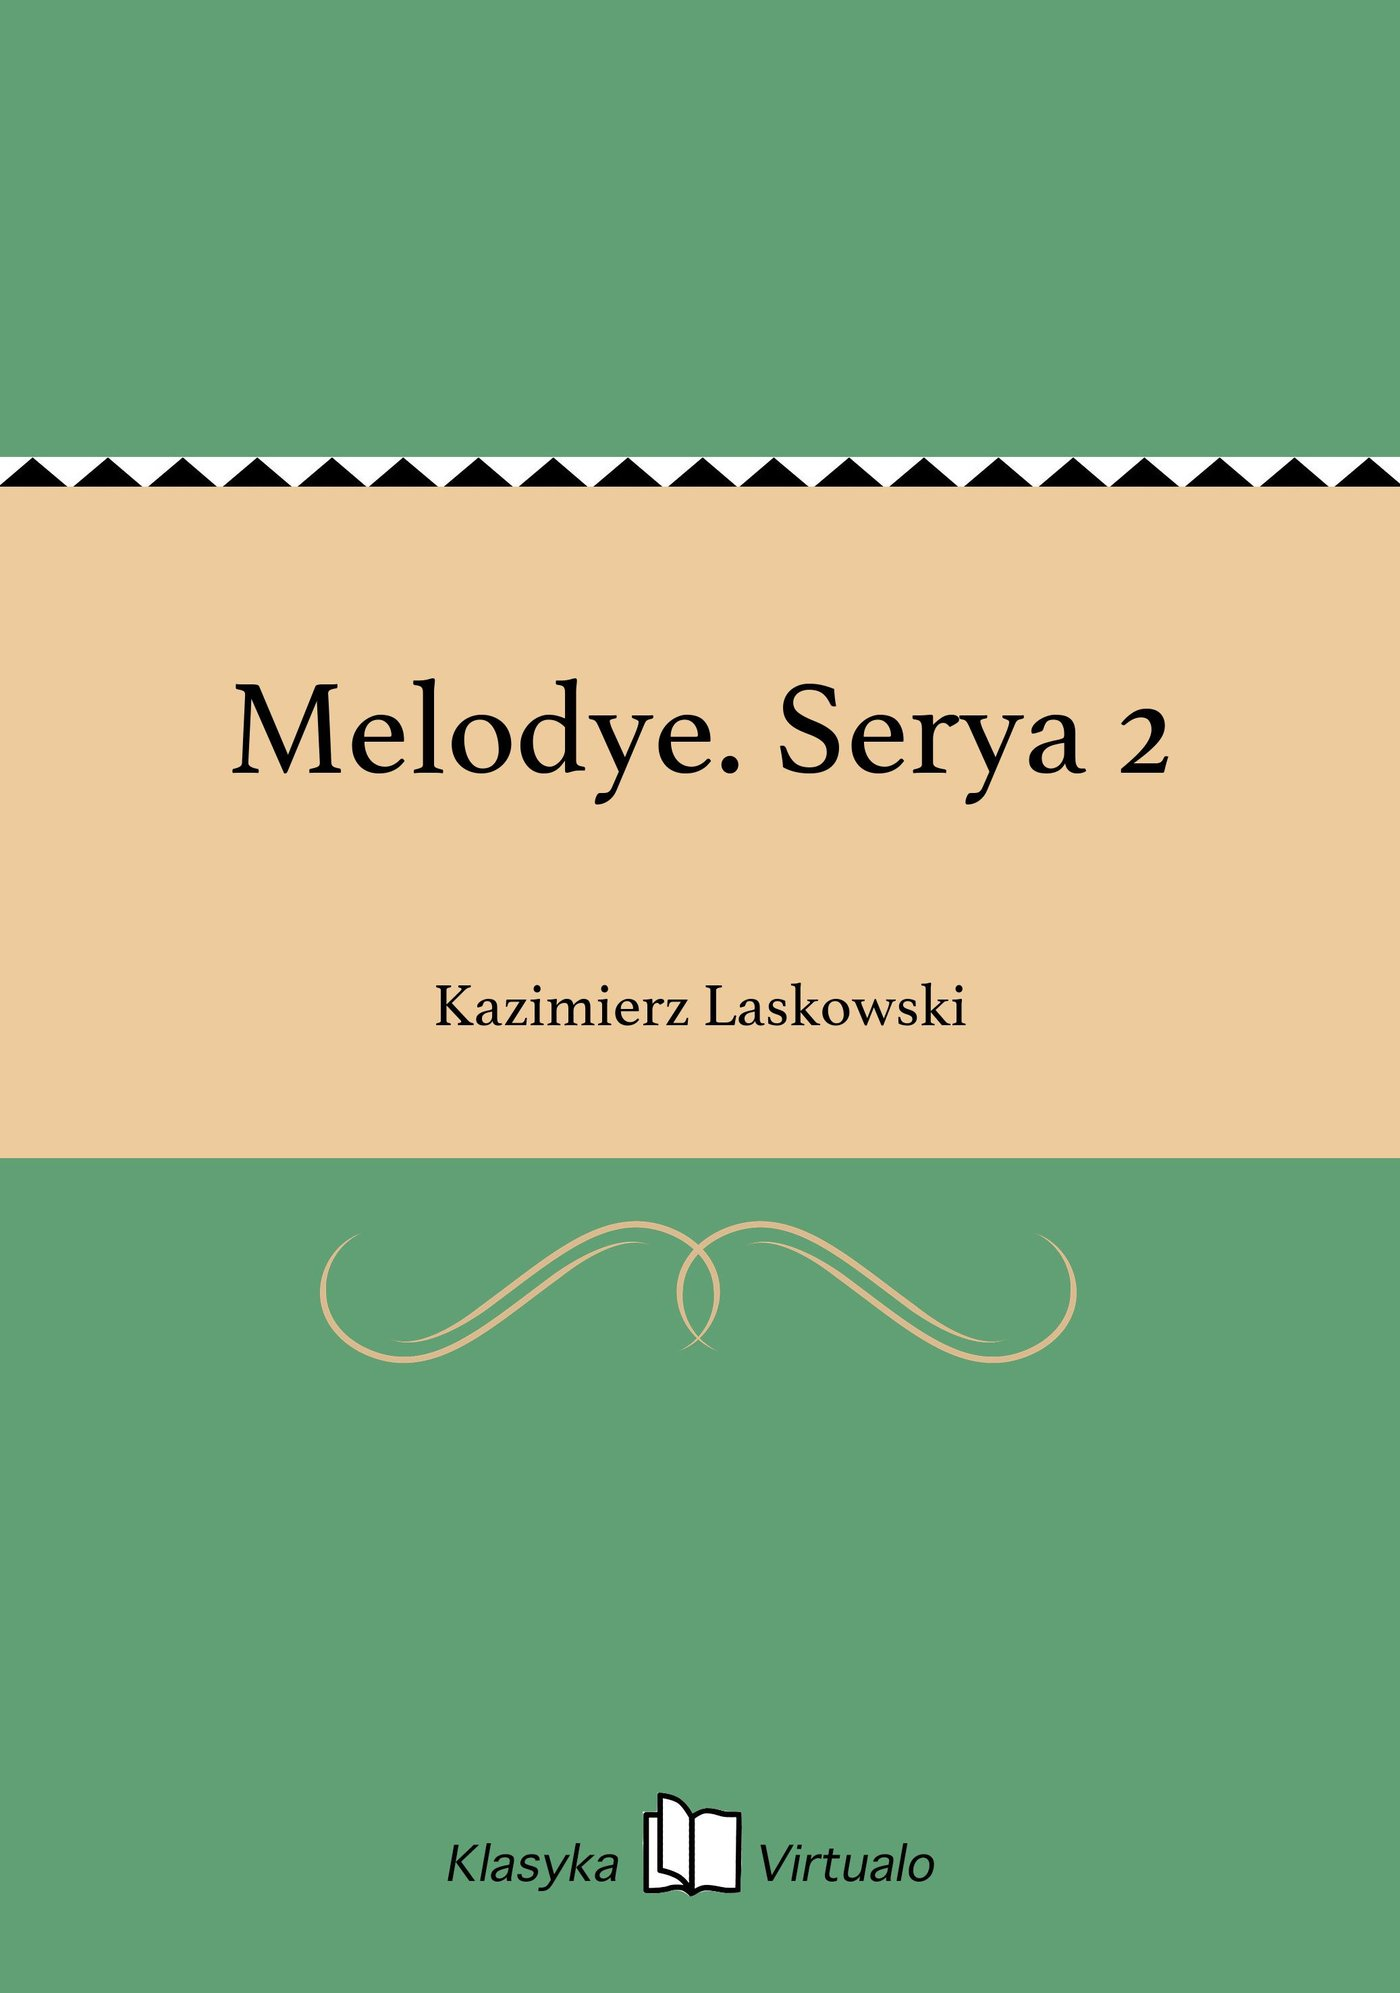 Melodye. Serya 2 - Ebook (Książka EPUB) do pobrania w formacie EPUB